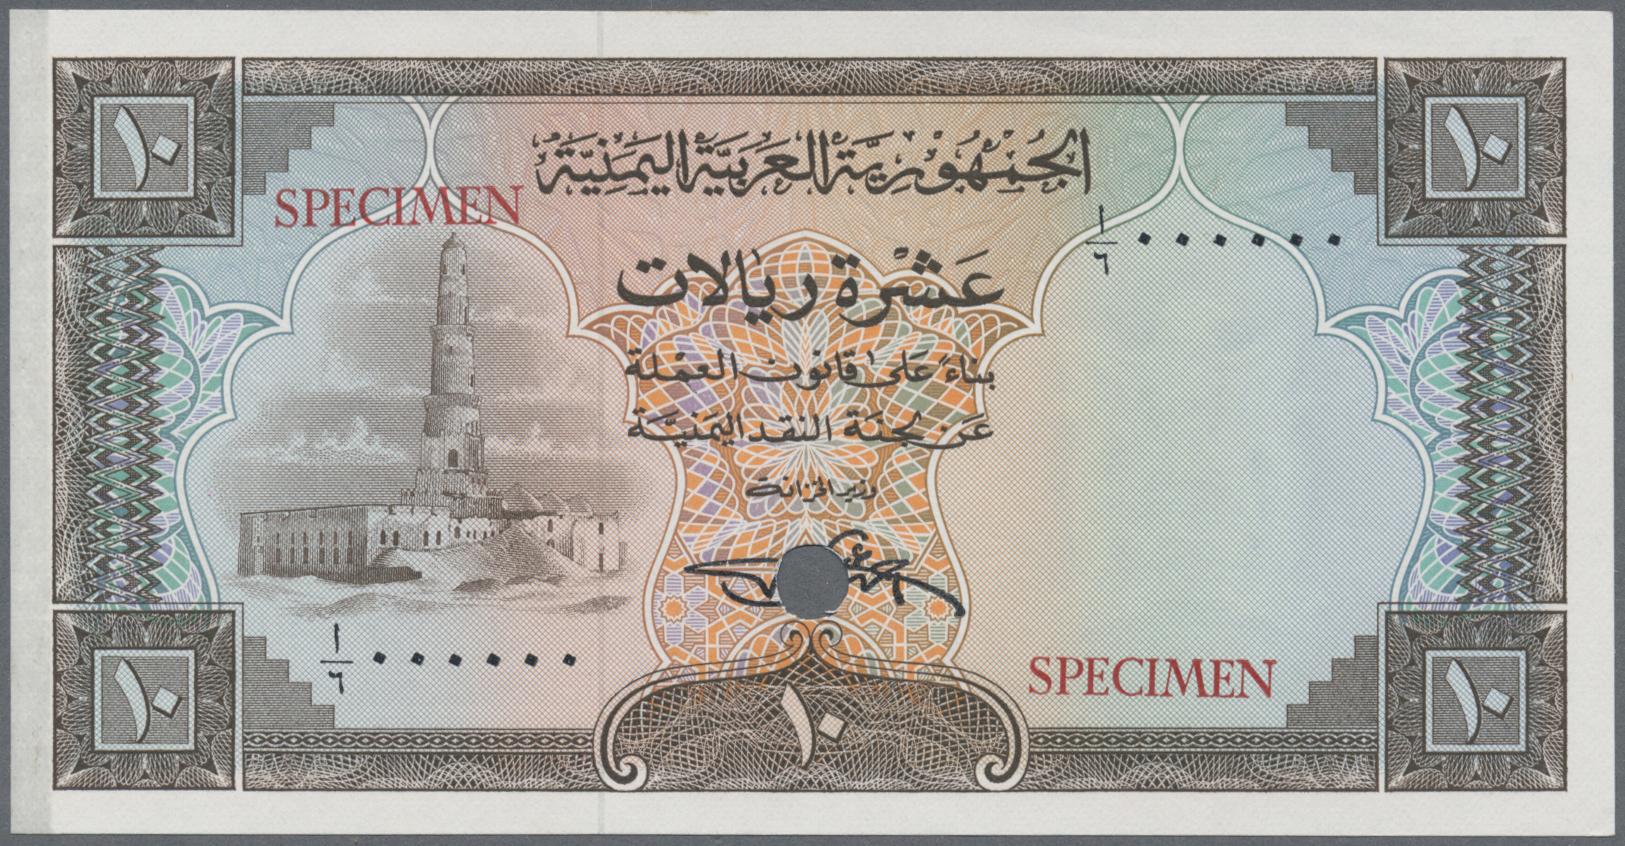 Lot 2259 - Yemen / Jemen   Banknoten  -  Auktionshaus Christoph Gärtner GmbH & Co. KG Banknotes & Coins Auction #39 Day 2